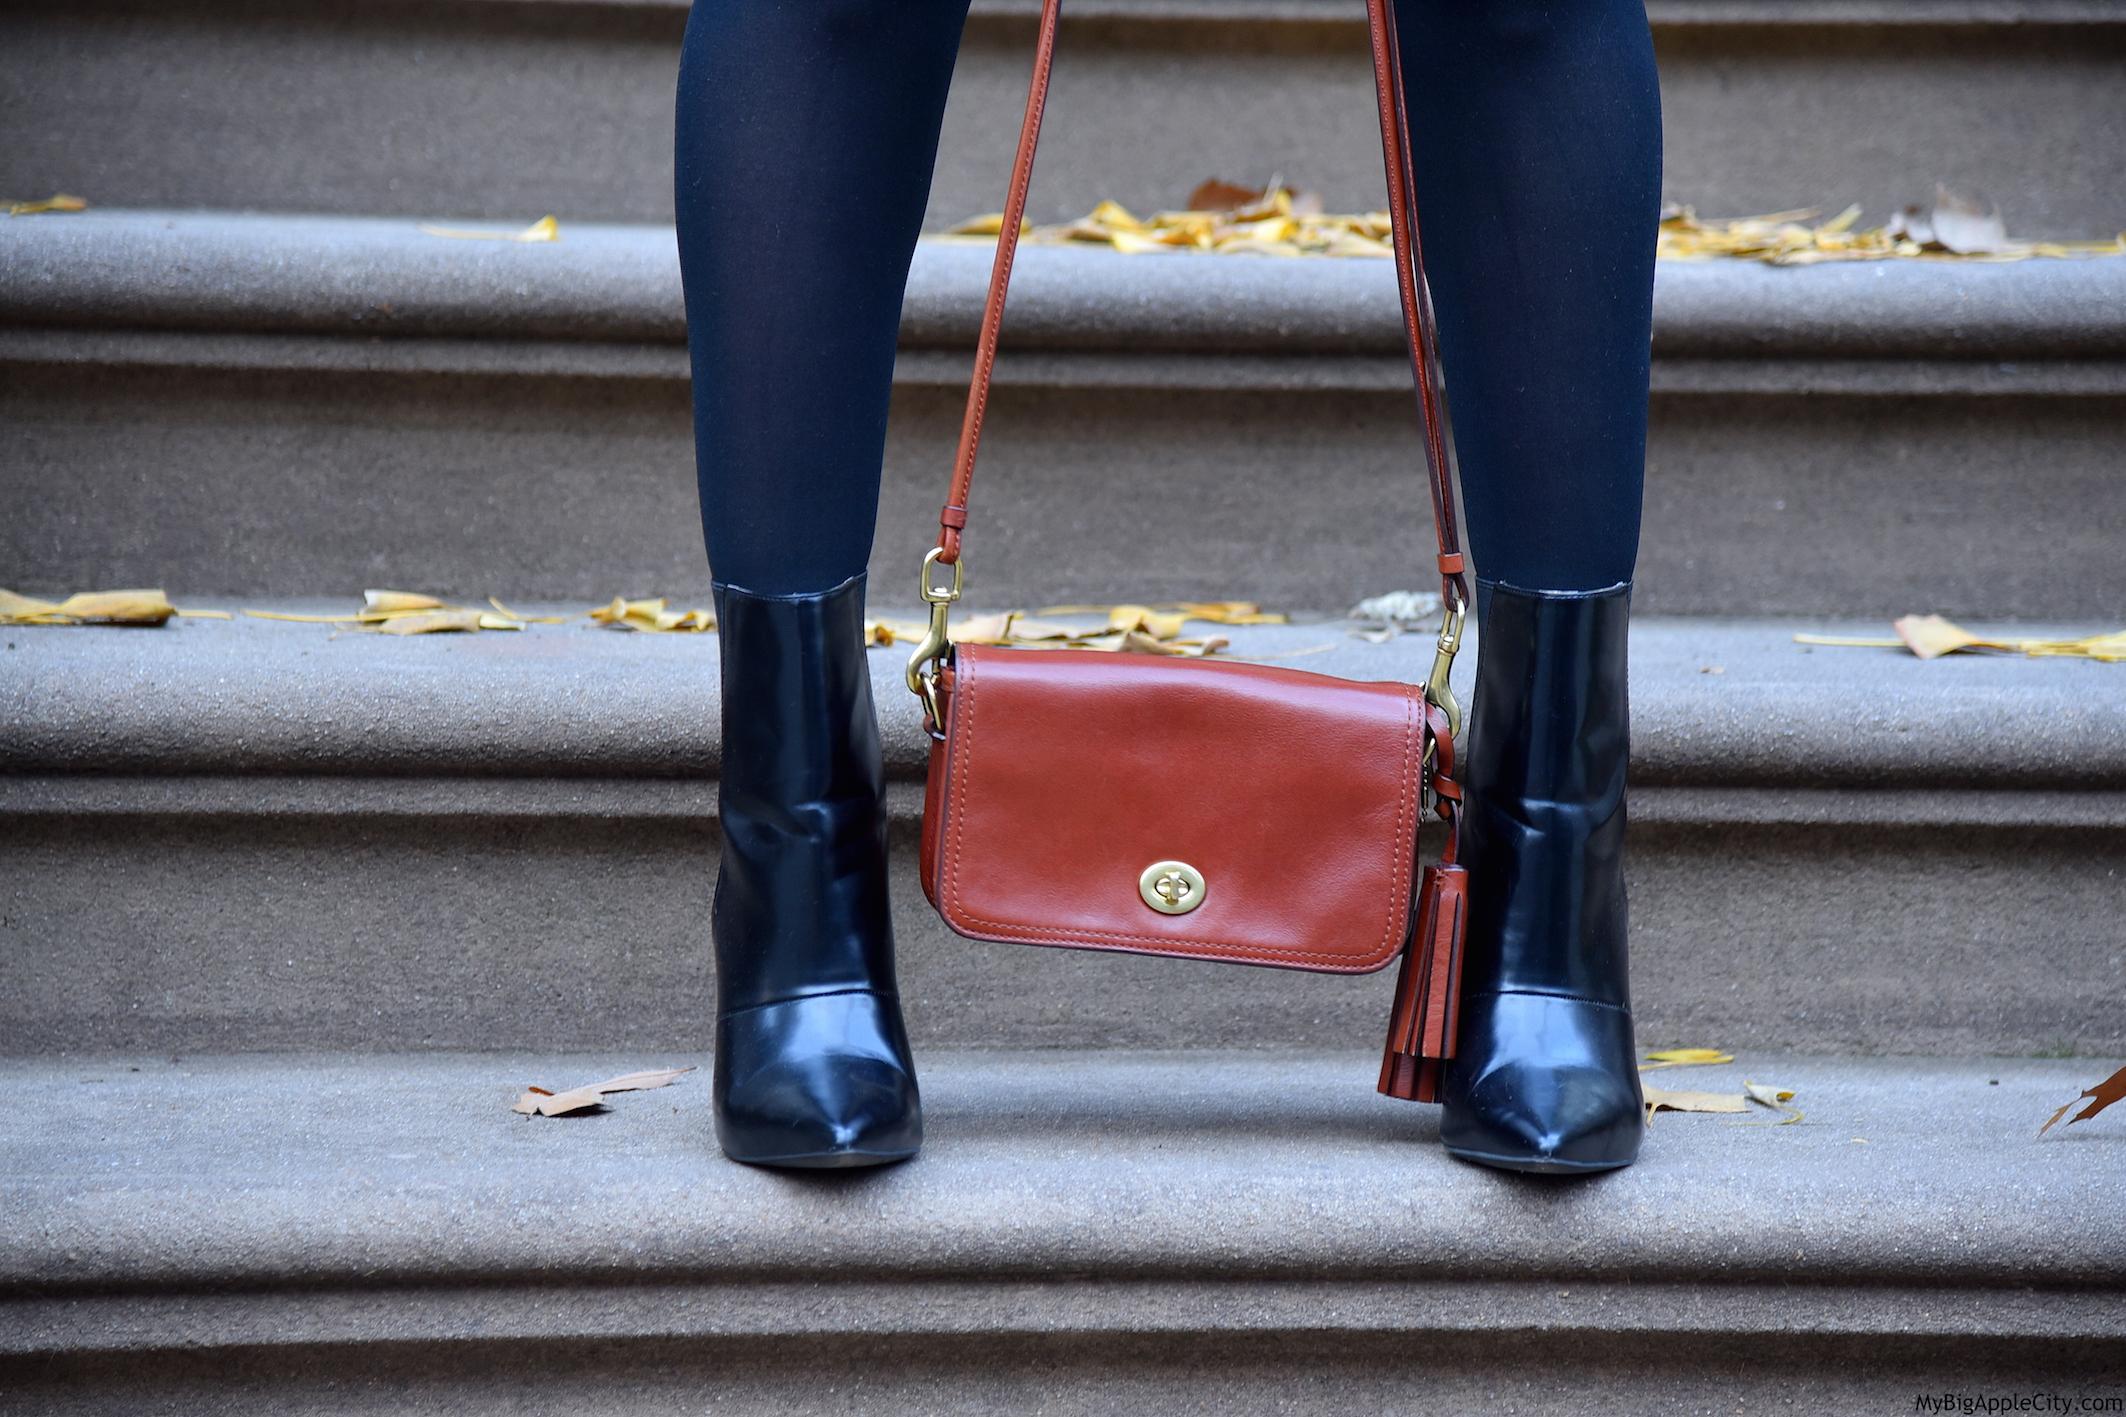 Coach-bag-OOTD-Look-fashionblog-nyc-mybigapplecity